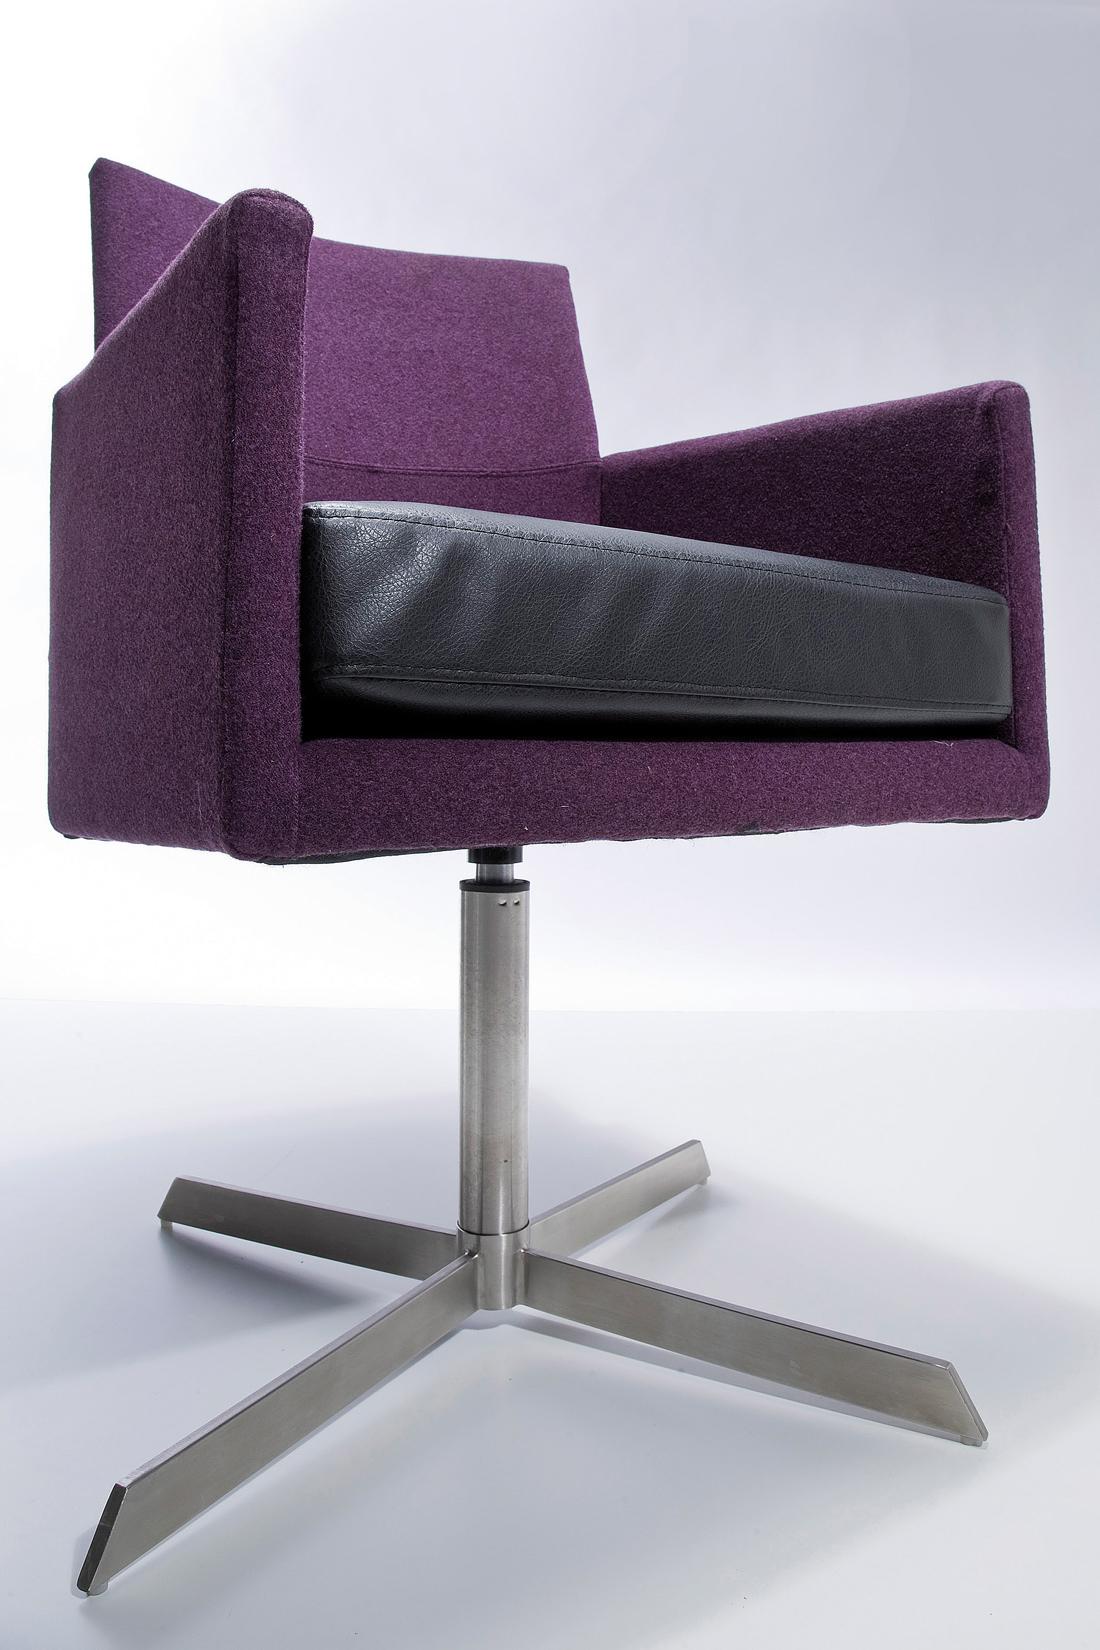 drehstuhl dialog purple | r.i.c.o. interior